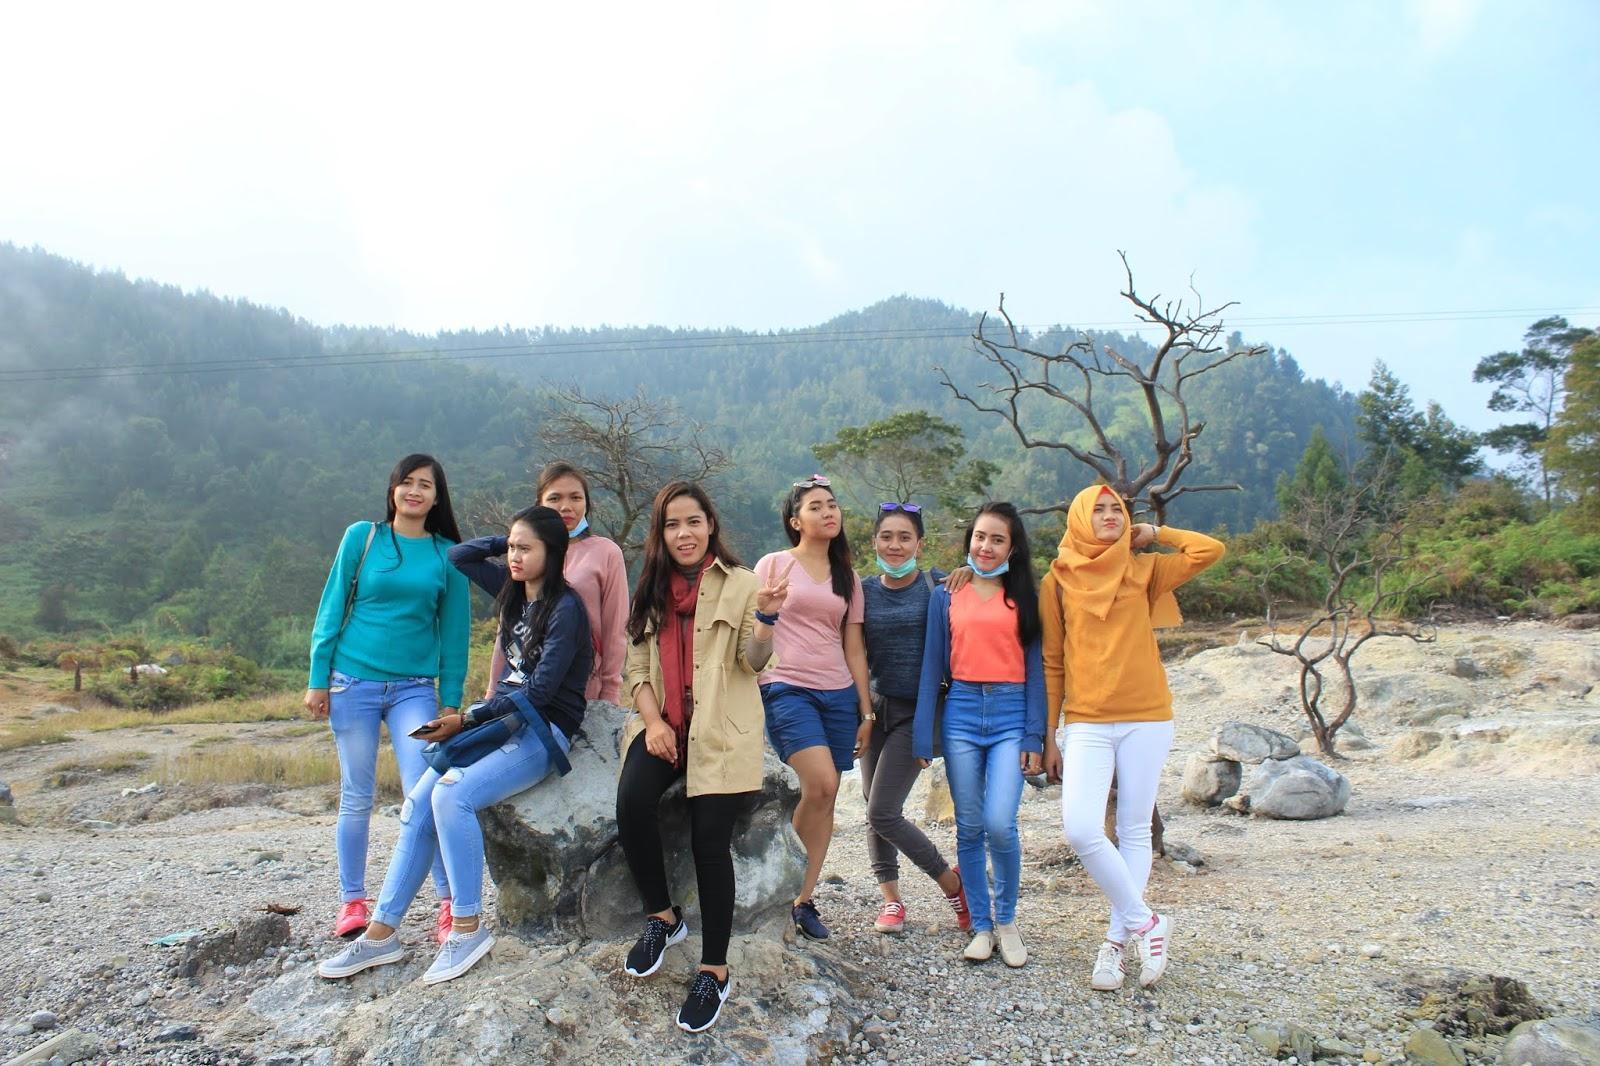 Tempat Wisata Di Dieng Wonosobo Banjarnegara Alternatif